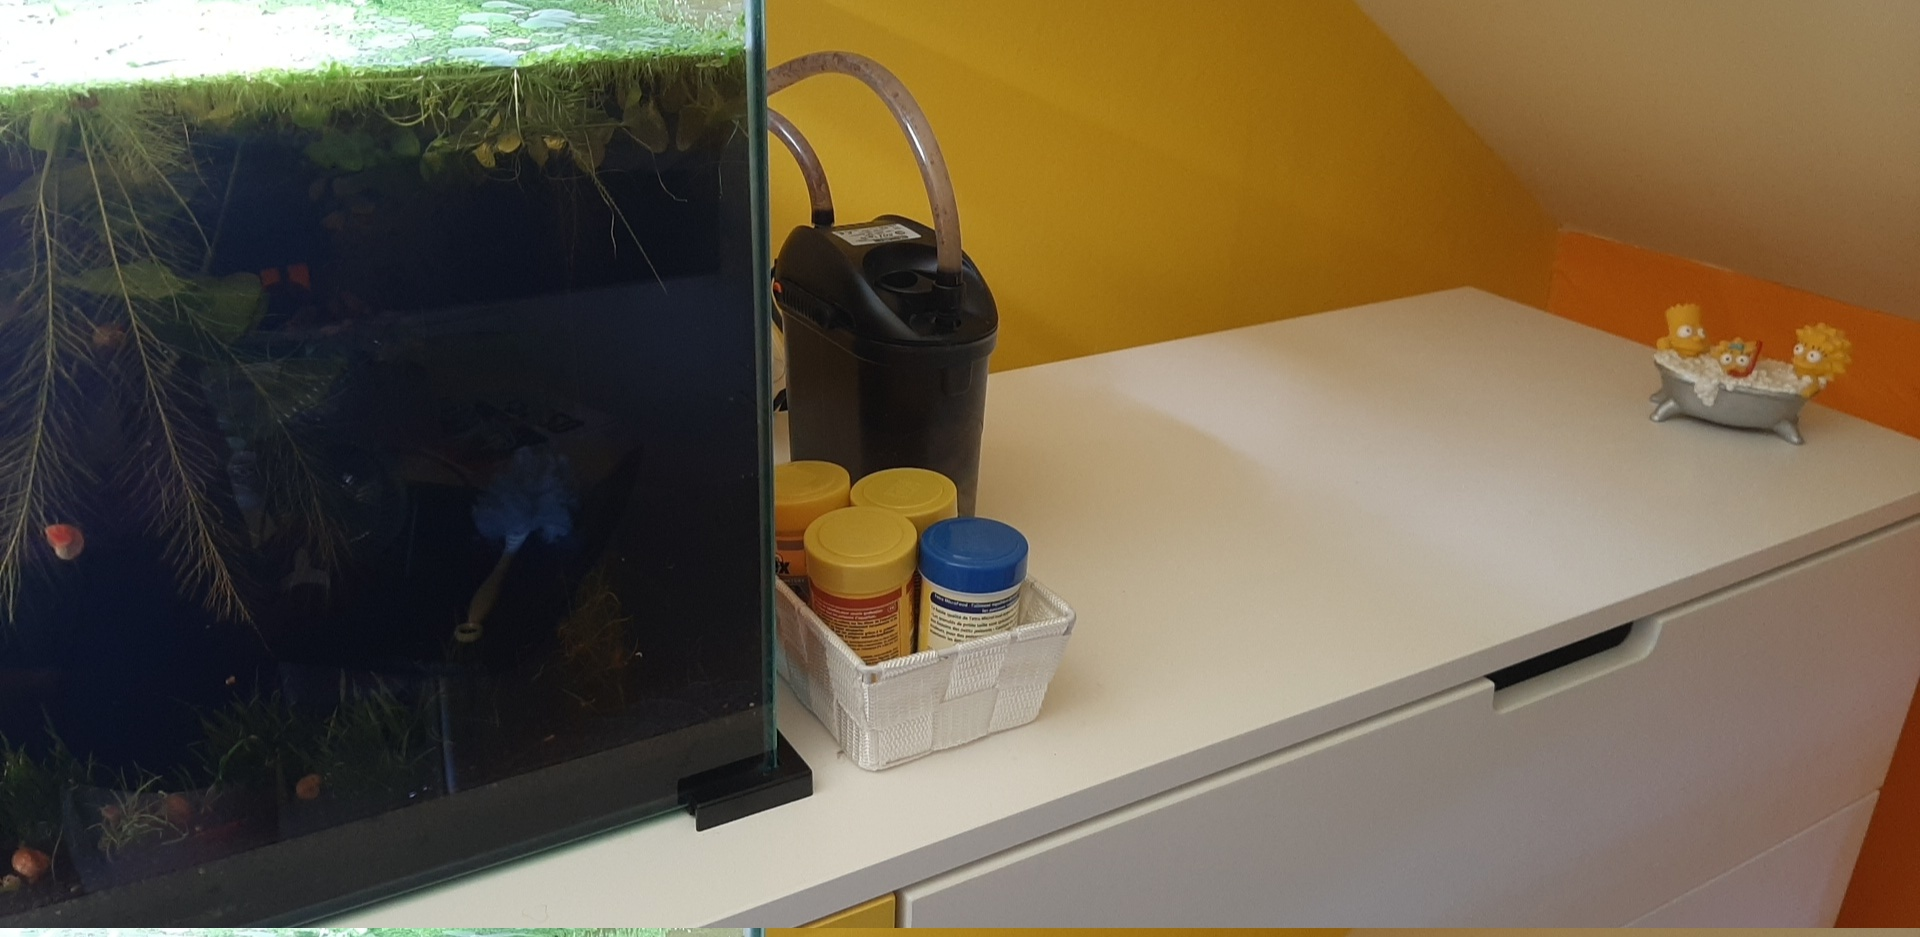 [RÉSOLU] Déplacer un aquarium de 30 litres Snapch60